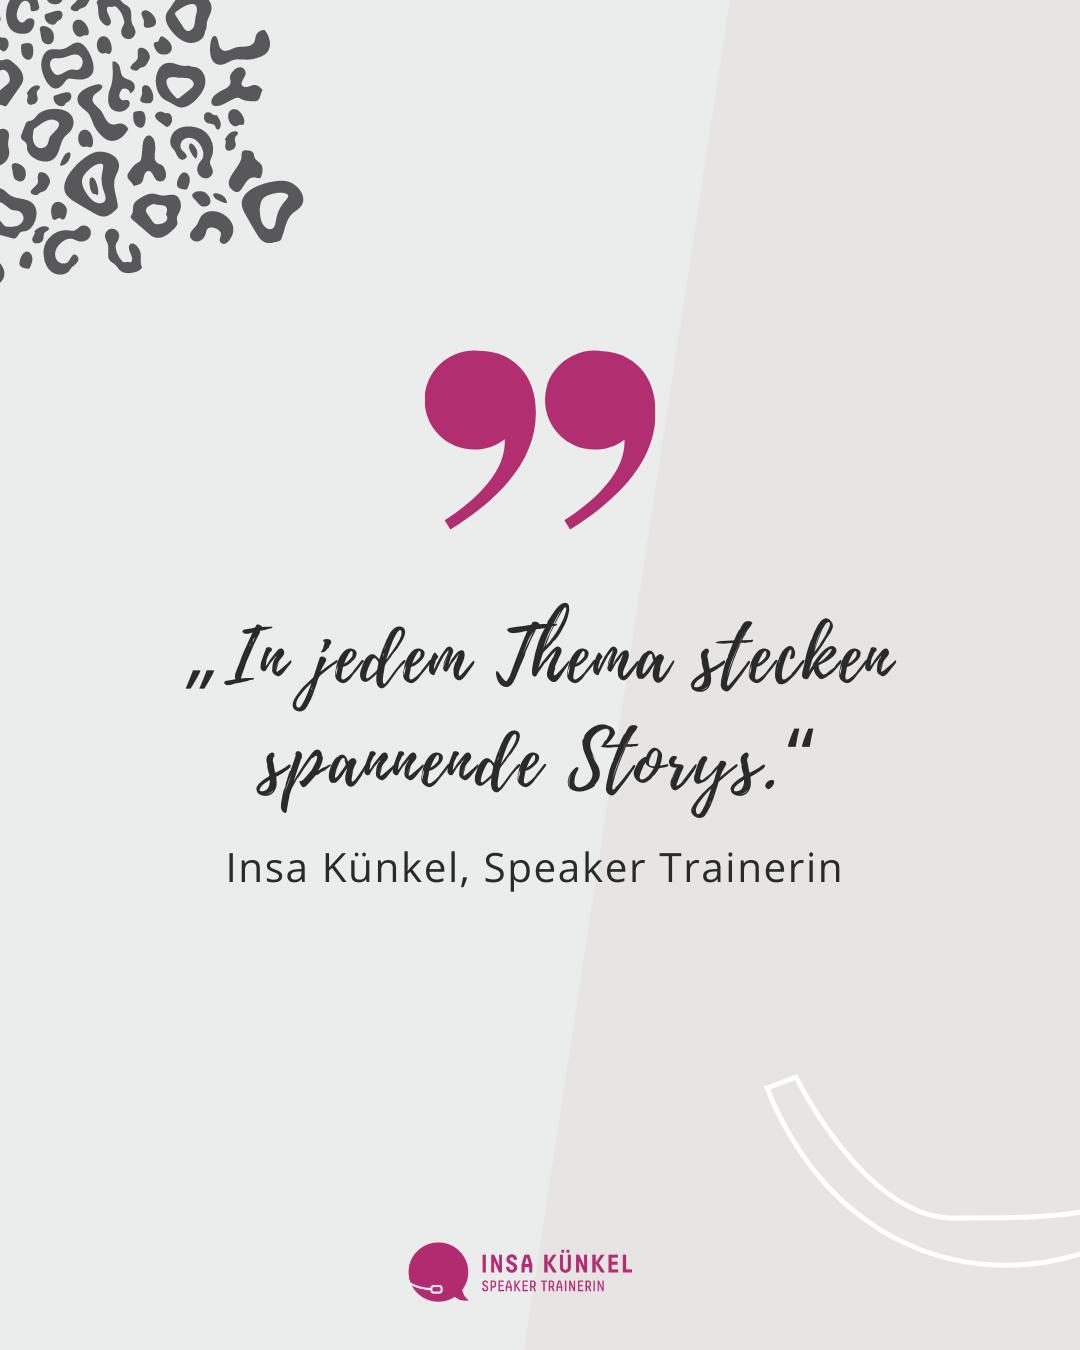 Vortrag-storytelling-tipps